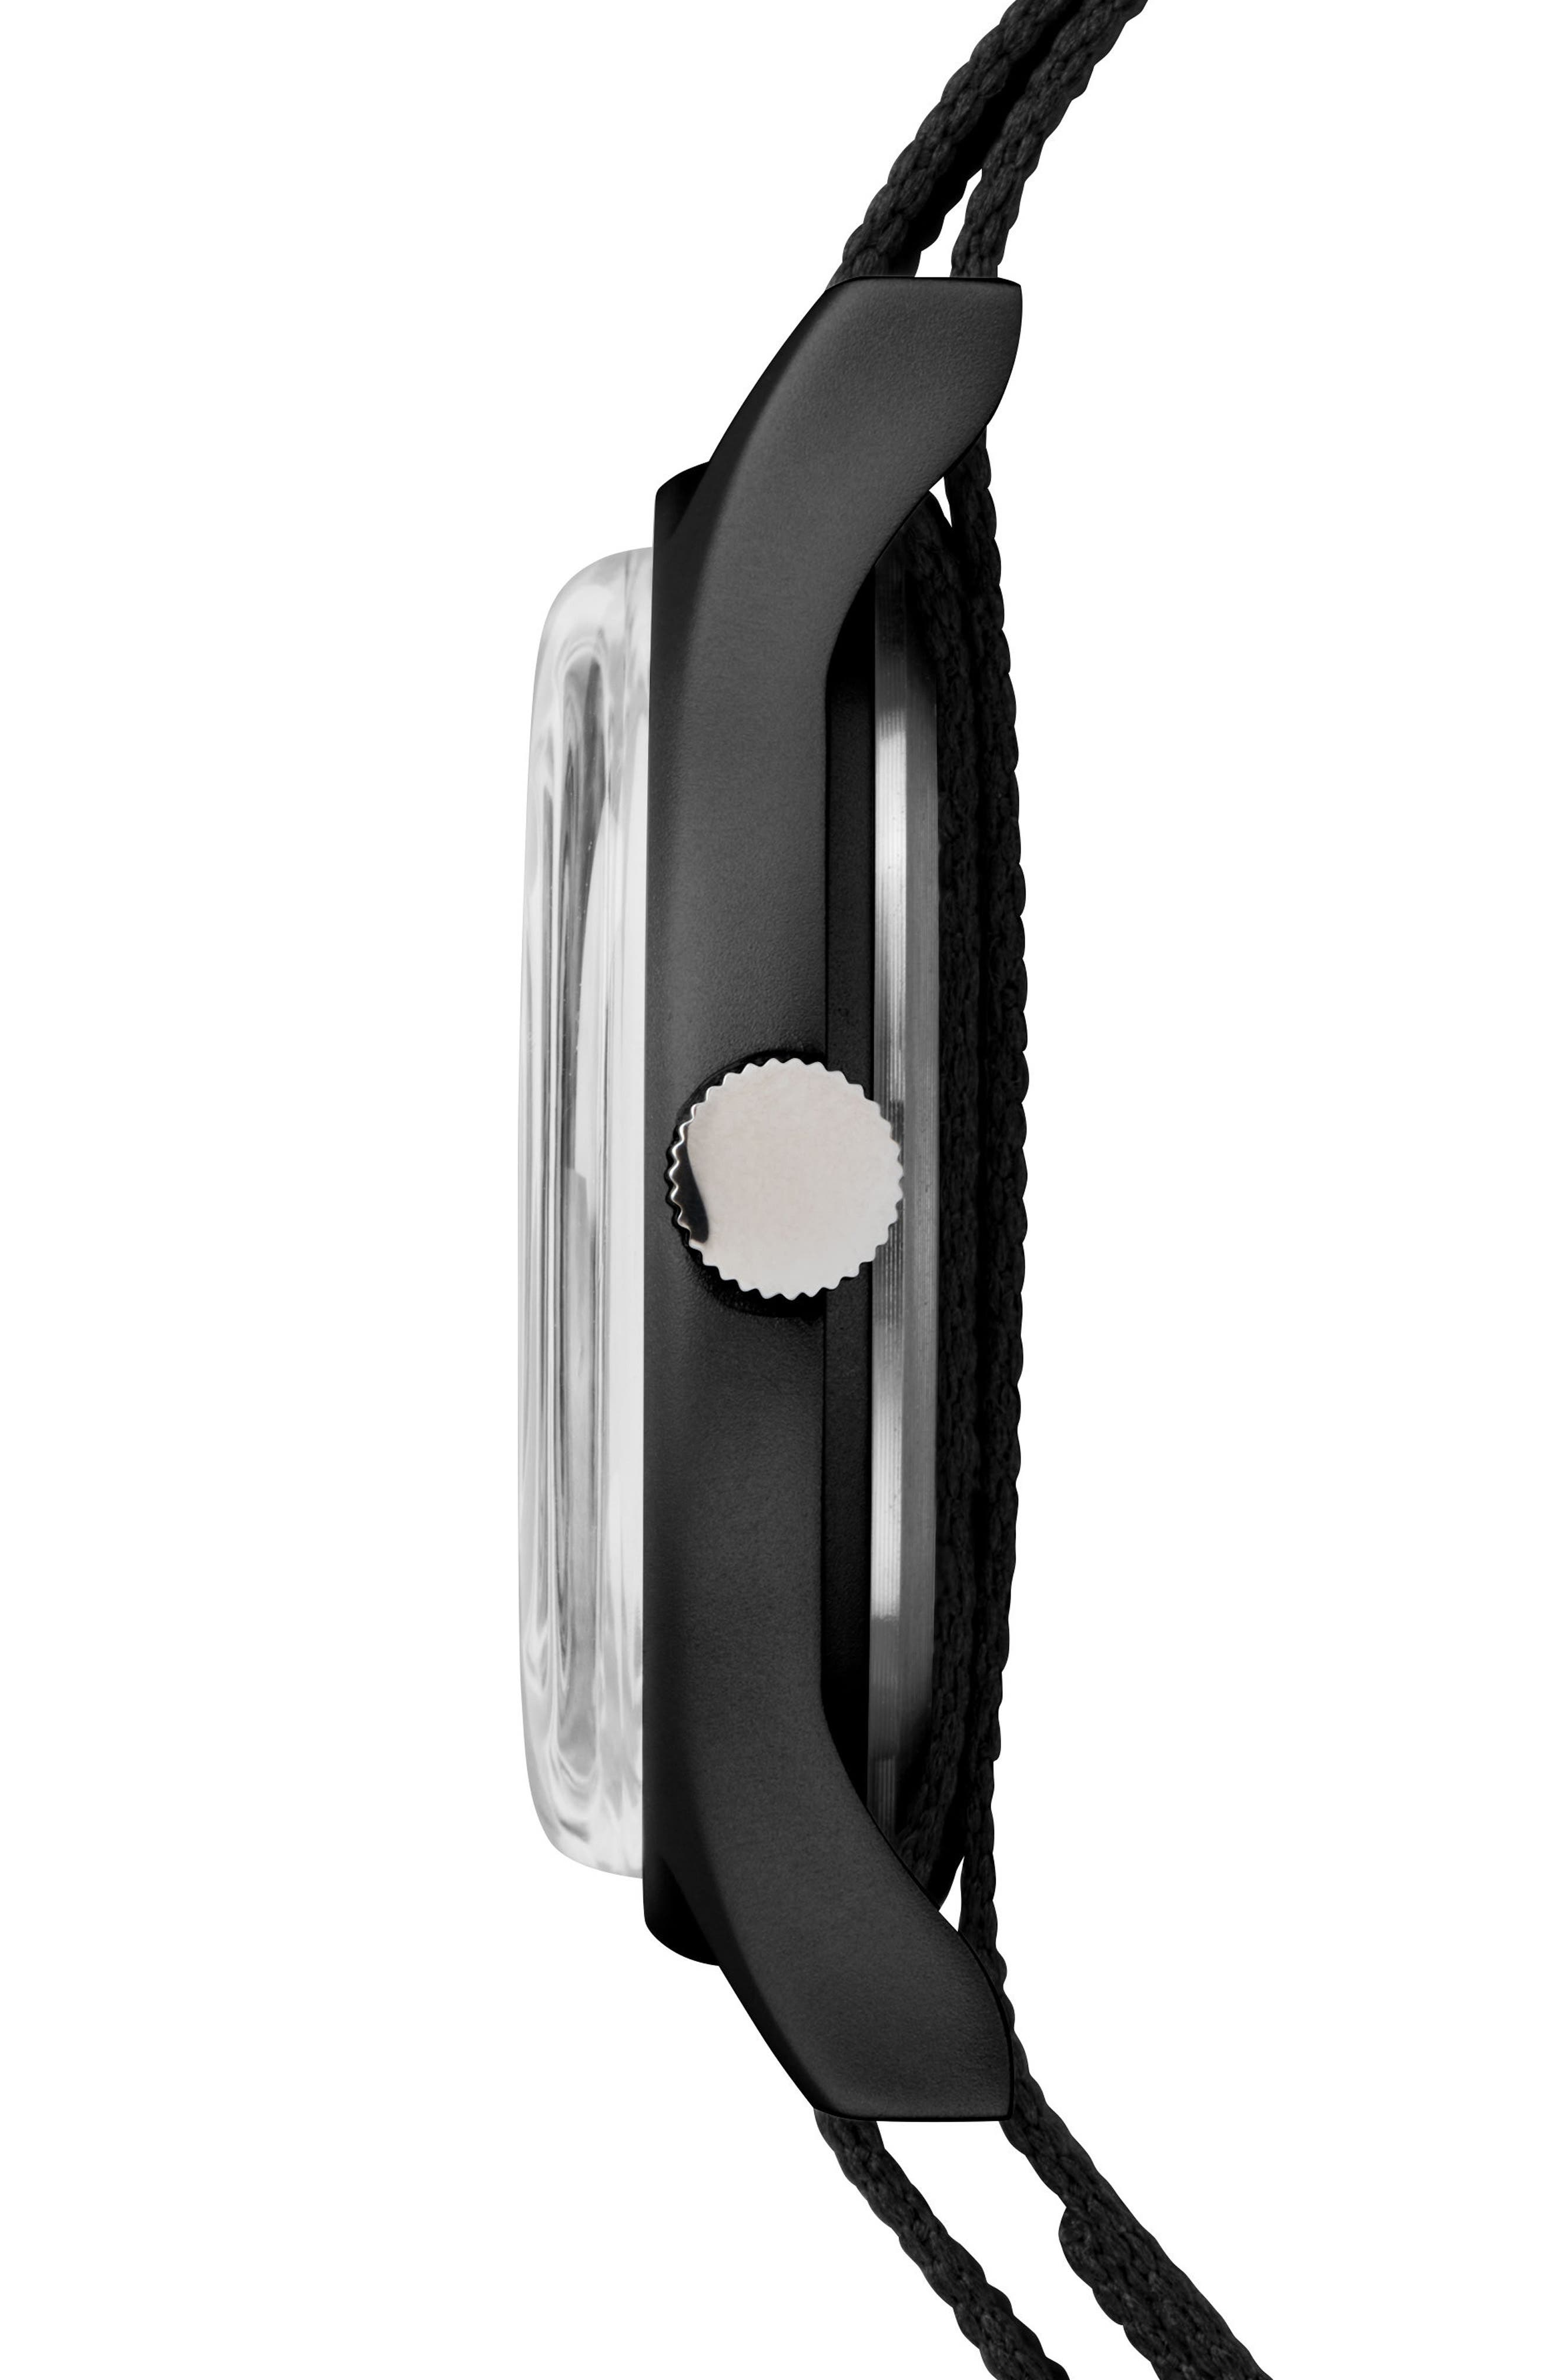 TIMEX<SUP>®</SUP>, Timex MK1 Nylon Strap Watch, 40mm, Alternate thumbnail 2, color, BLACK